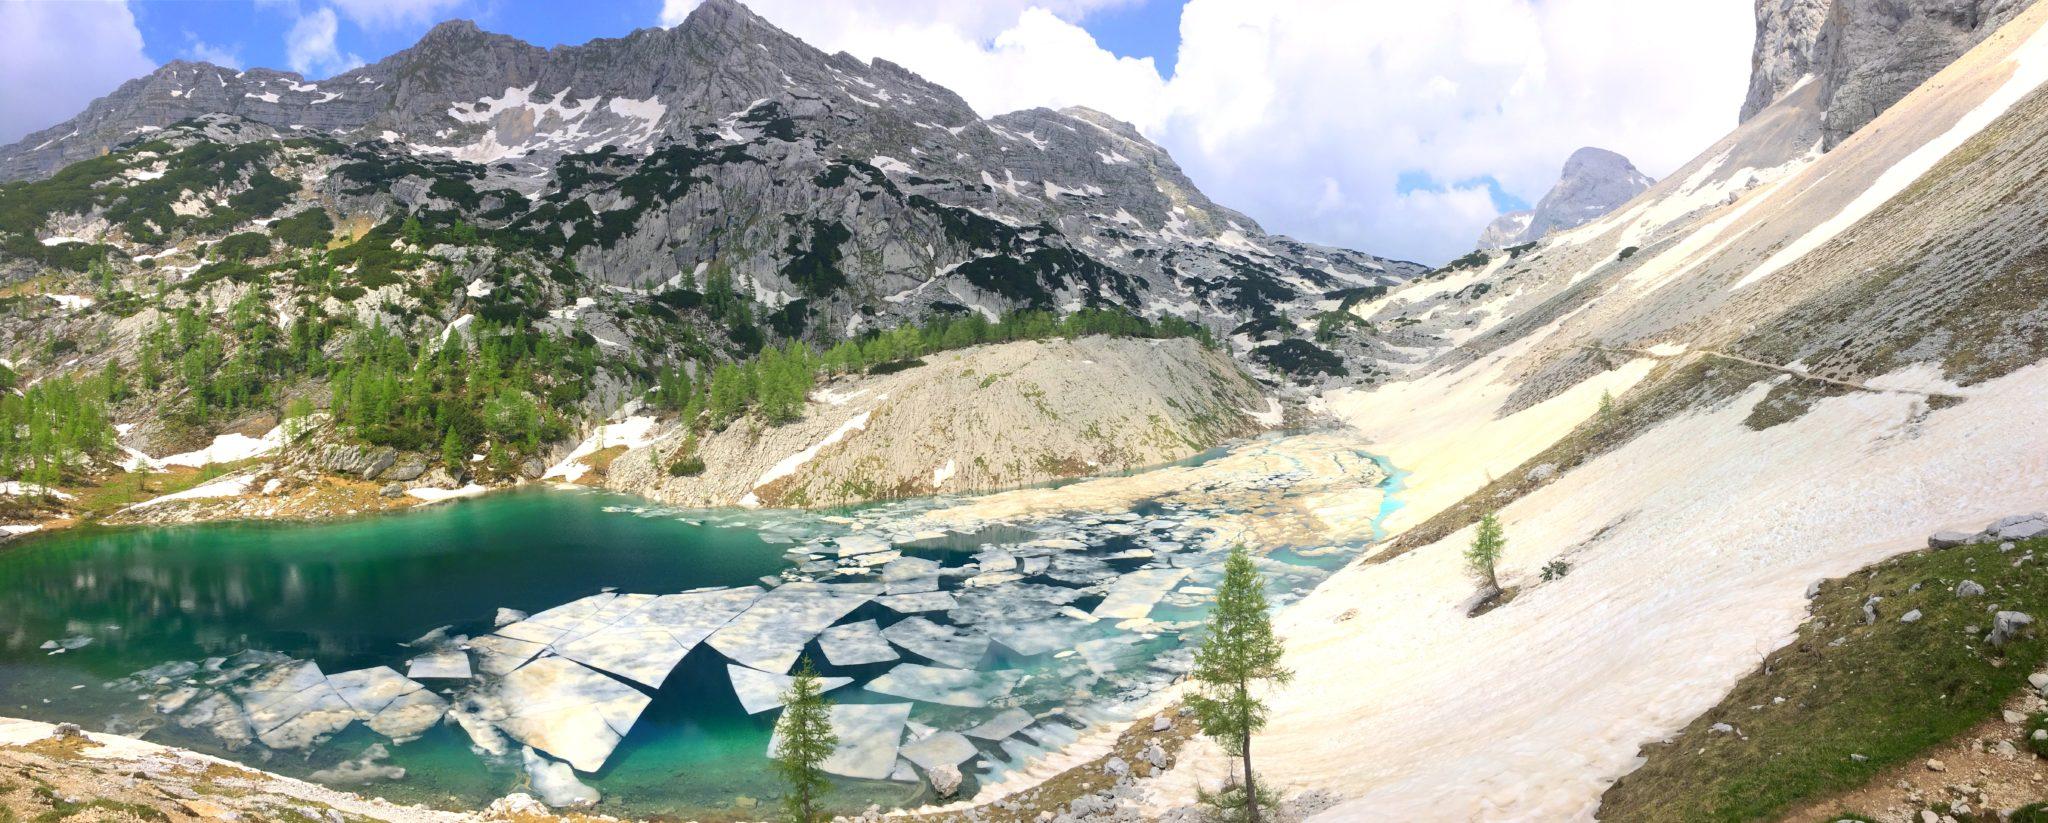 The Big Lake of the Triglav Lakes, Julian Alps, Slovenia